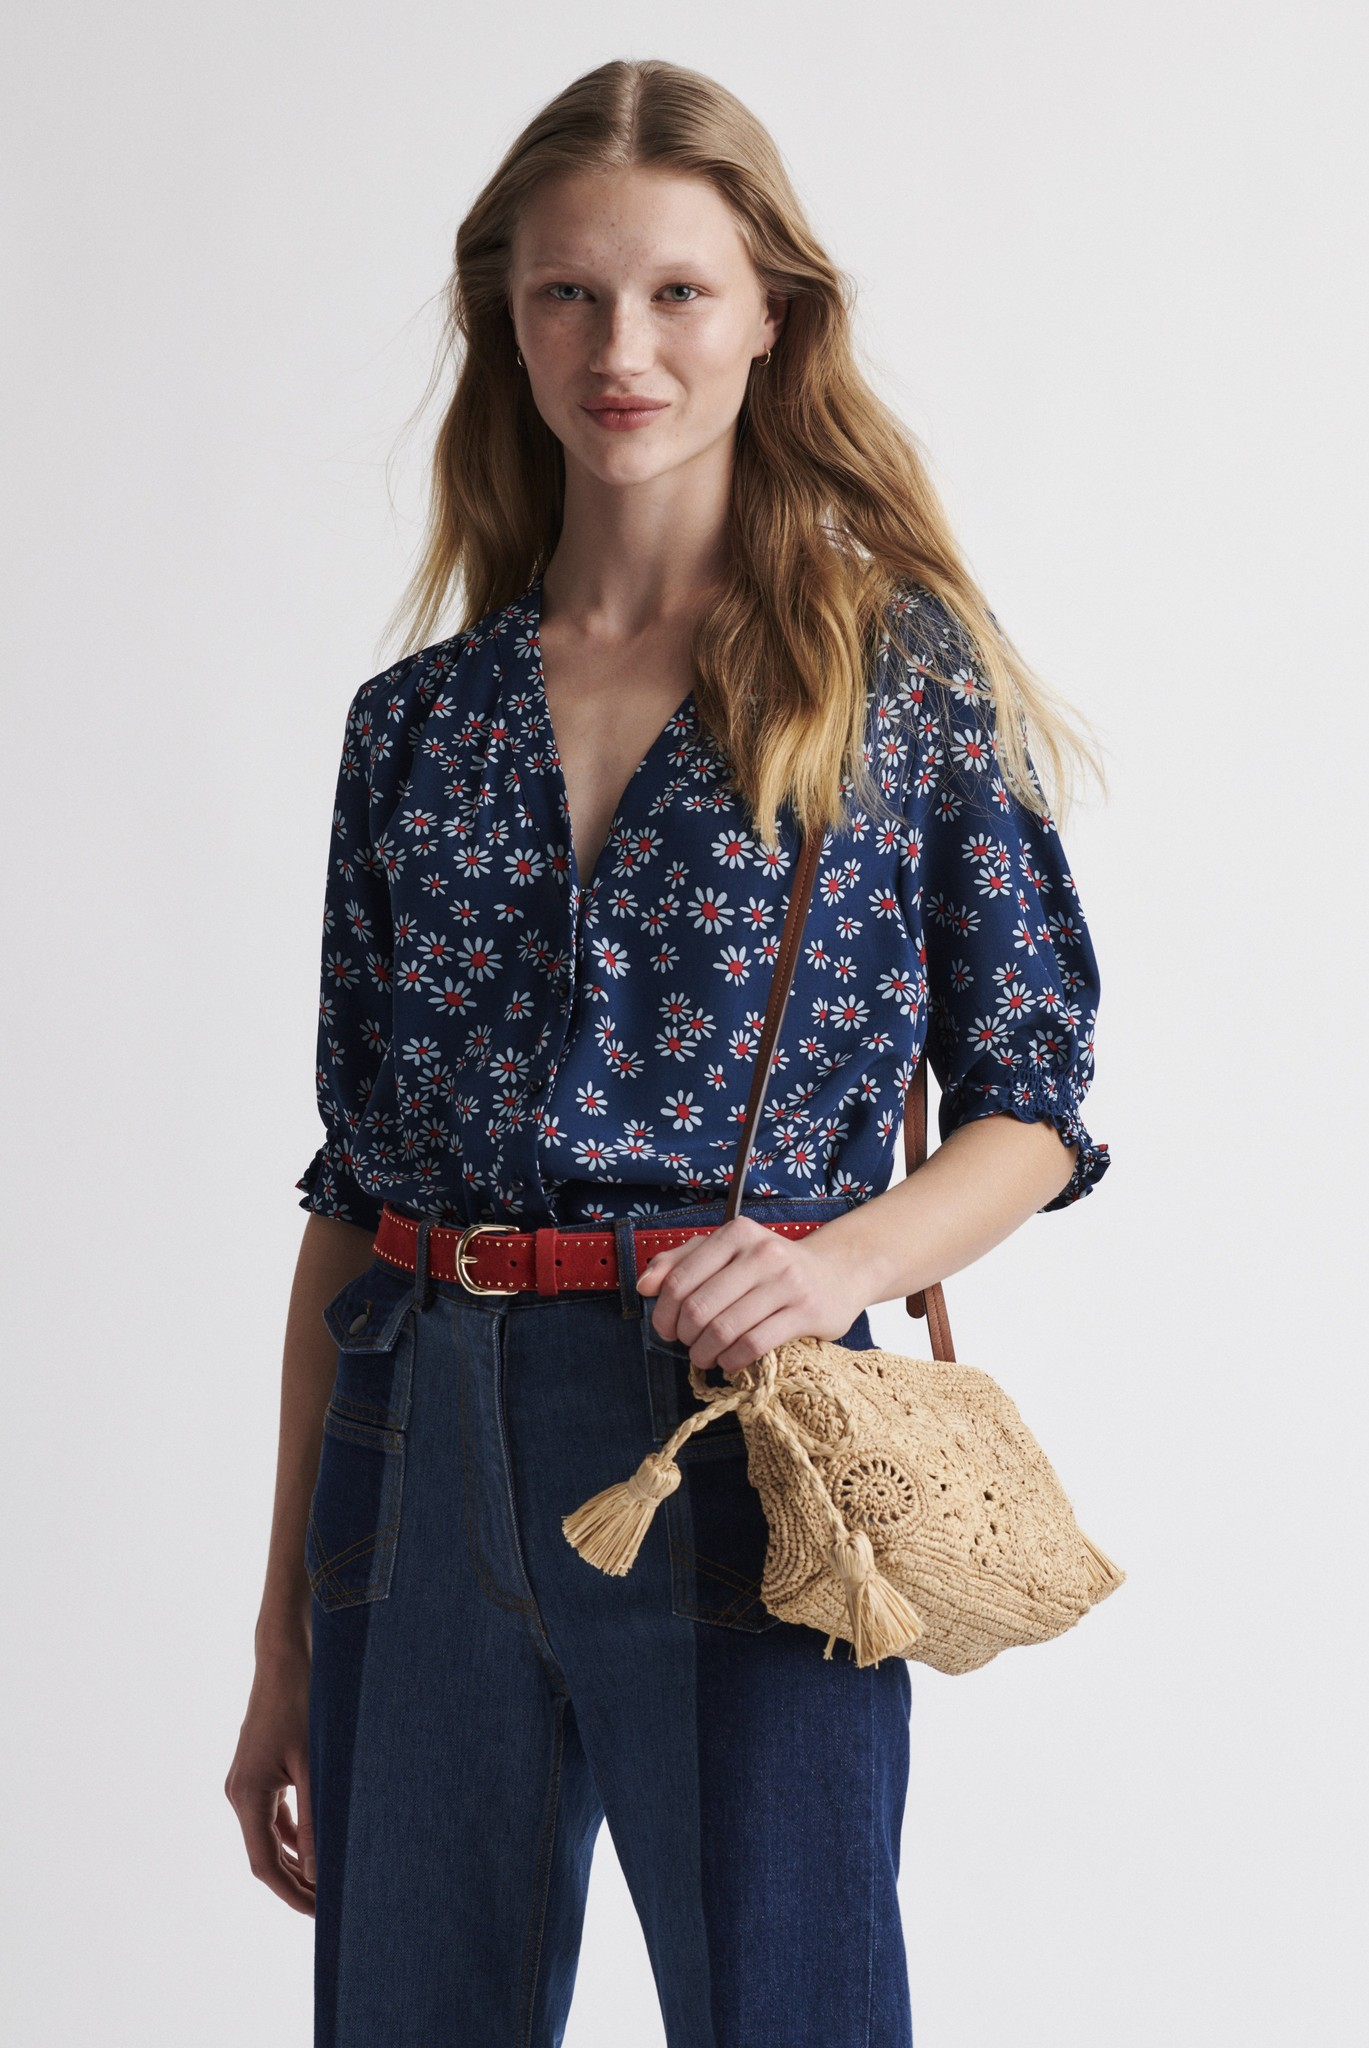 NOVELLA - блузка из шелка с принтом